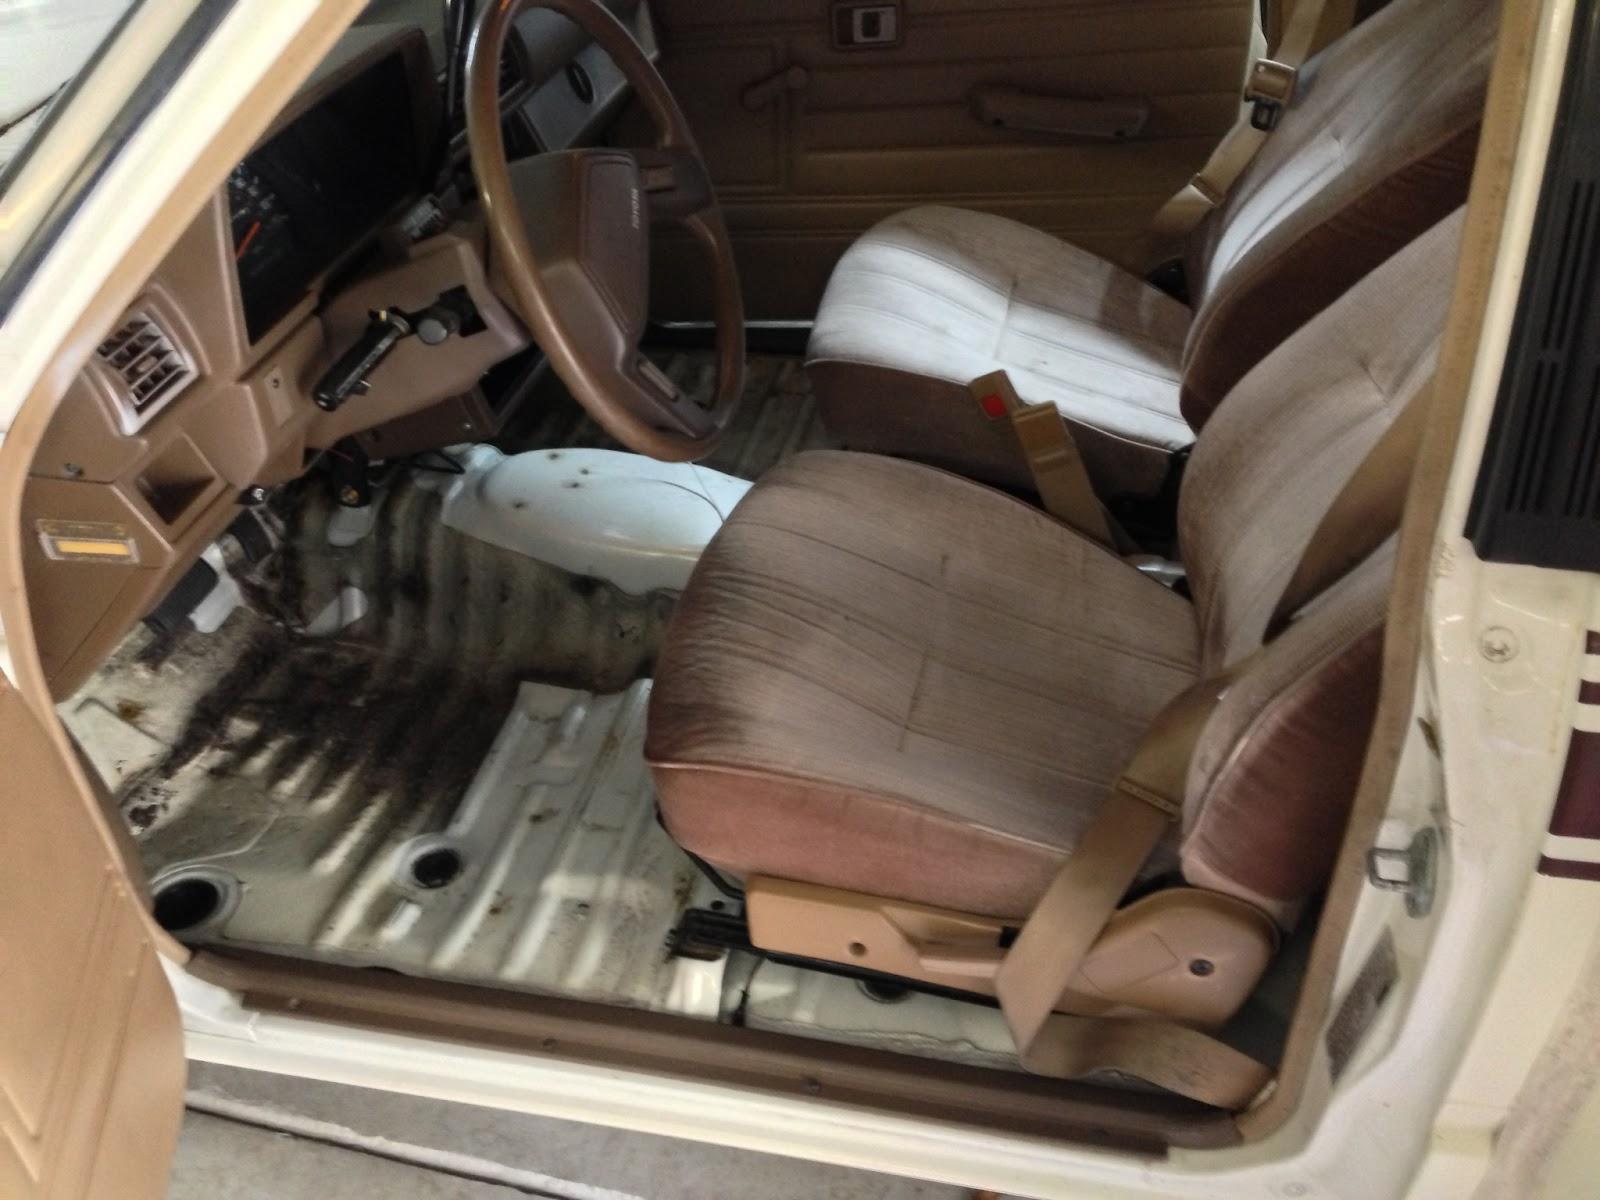 Seventh 1987 Toyota Truck Carpet Dynamat Install Days Of Fuel Filter Exploration